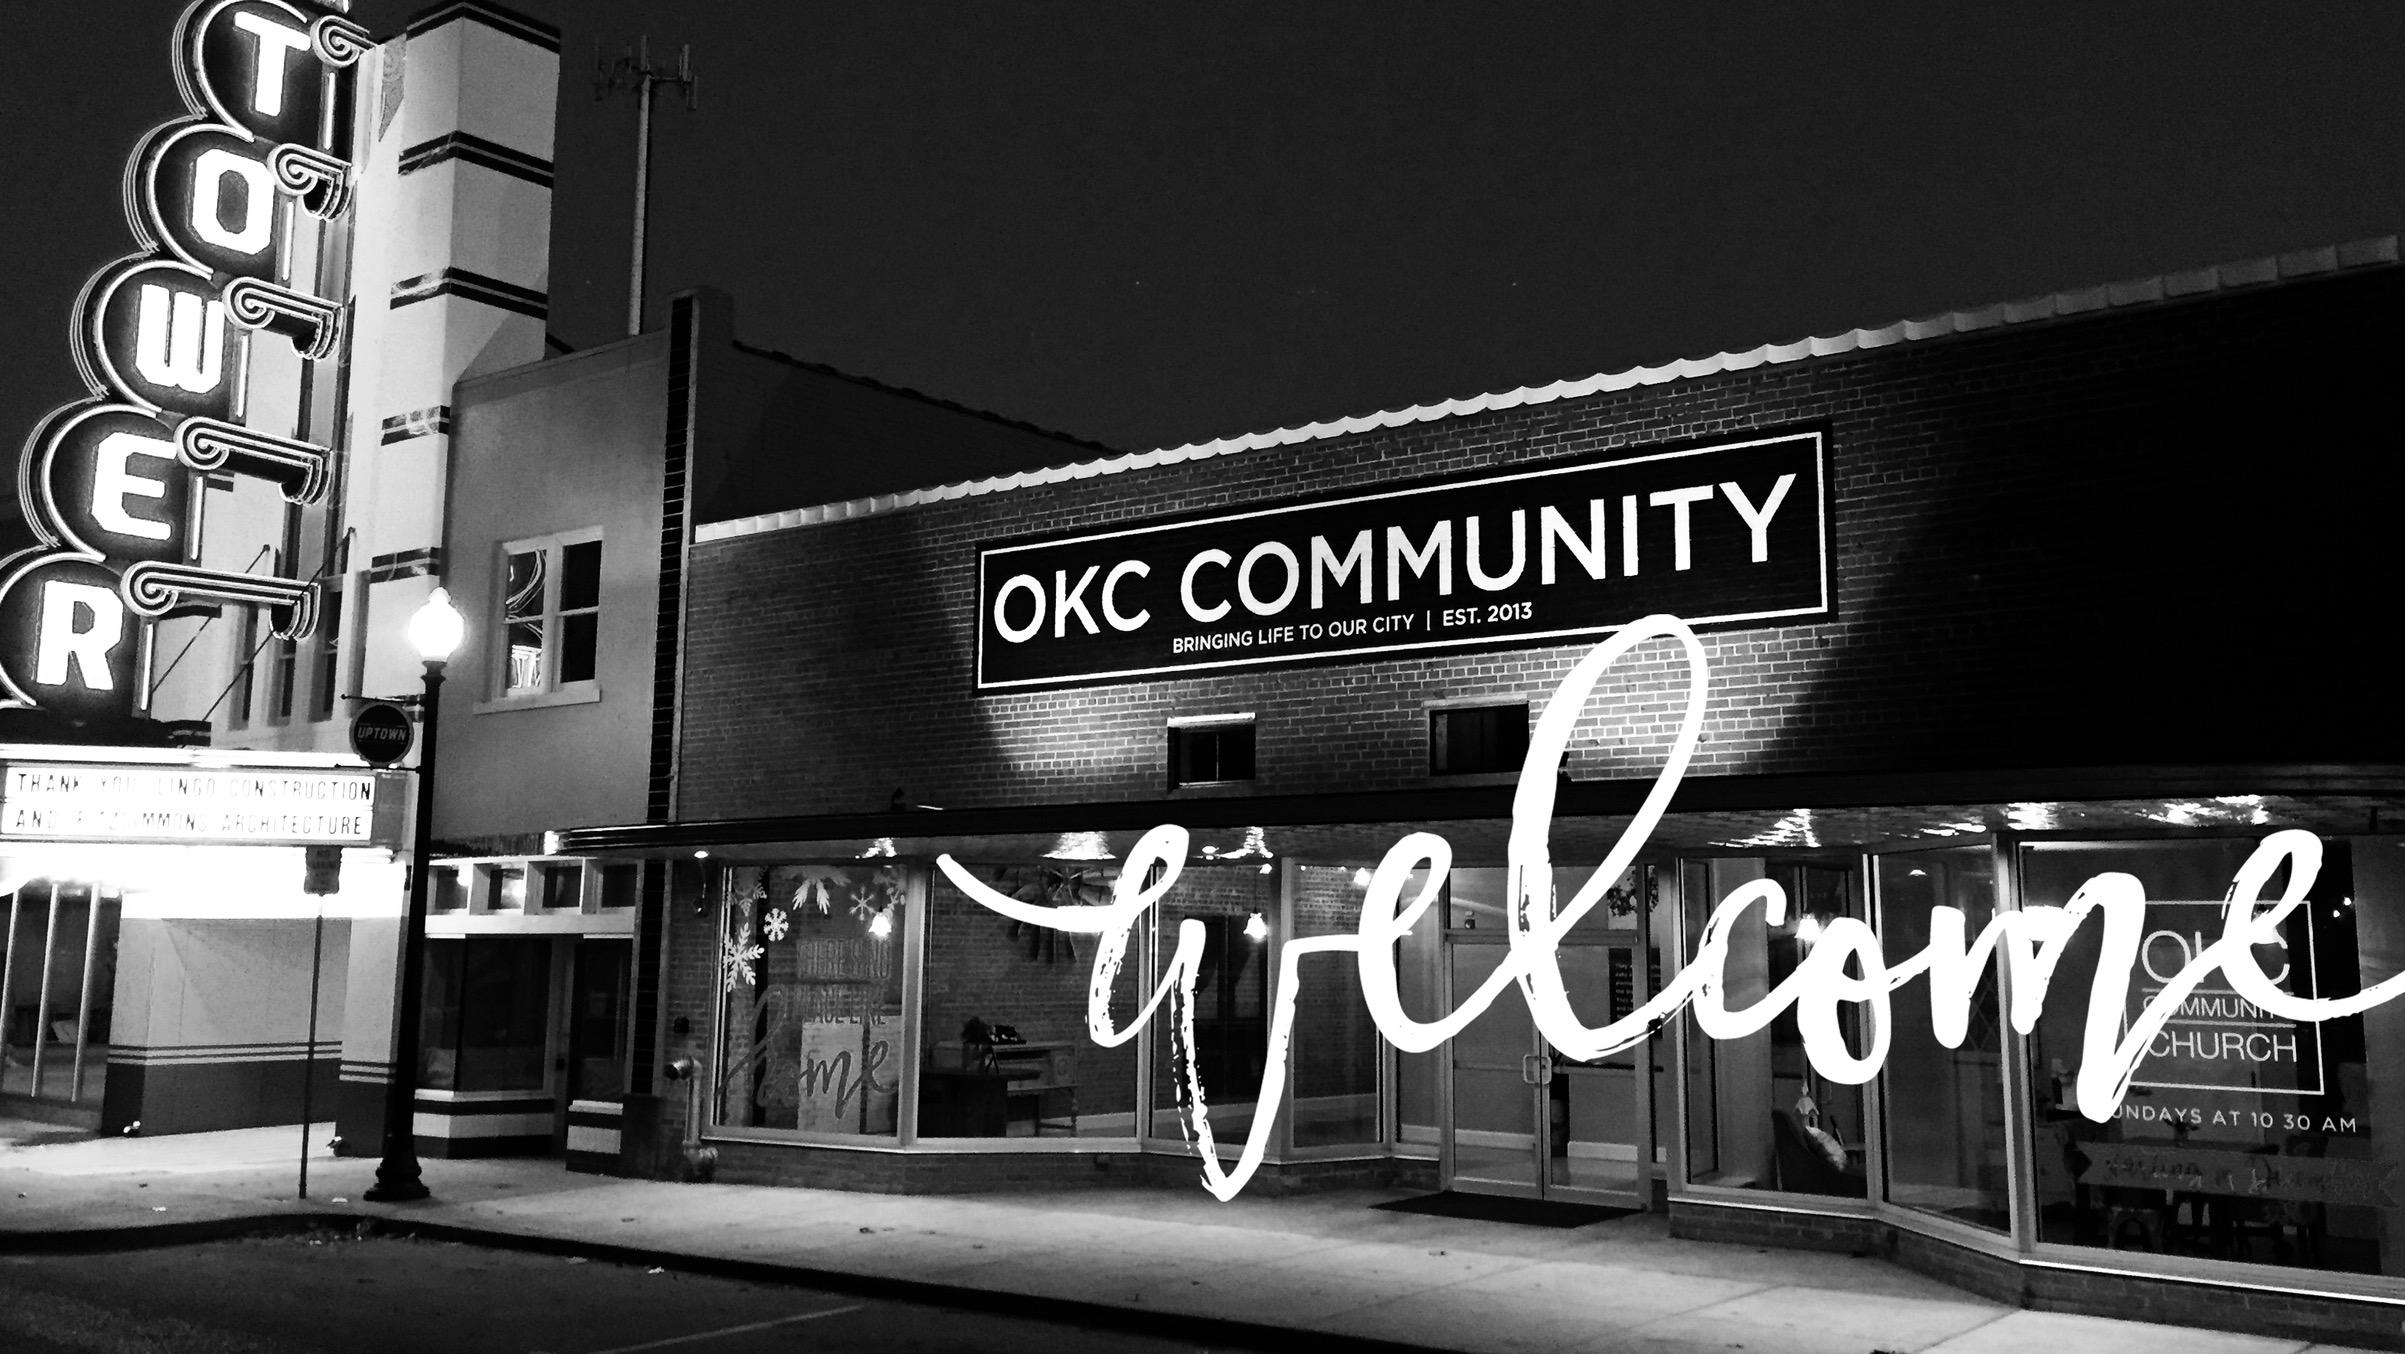 OKC.Community.Church.png